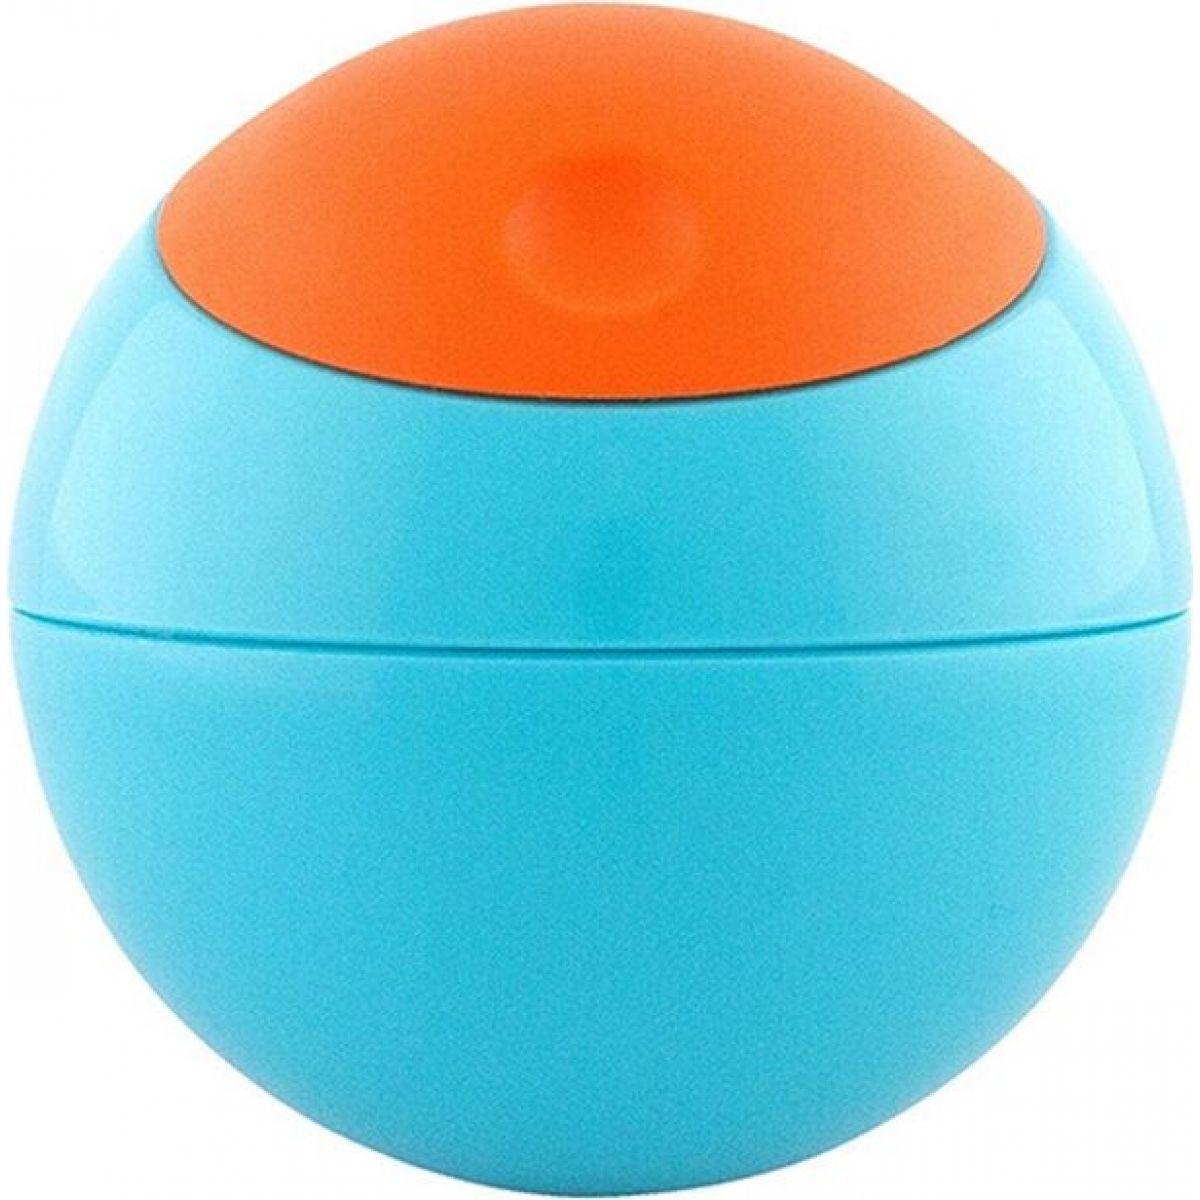 Boon Guľatá desiatová nádobka modro-oranžová